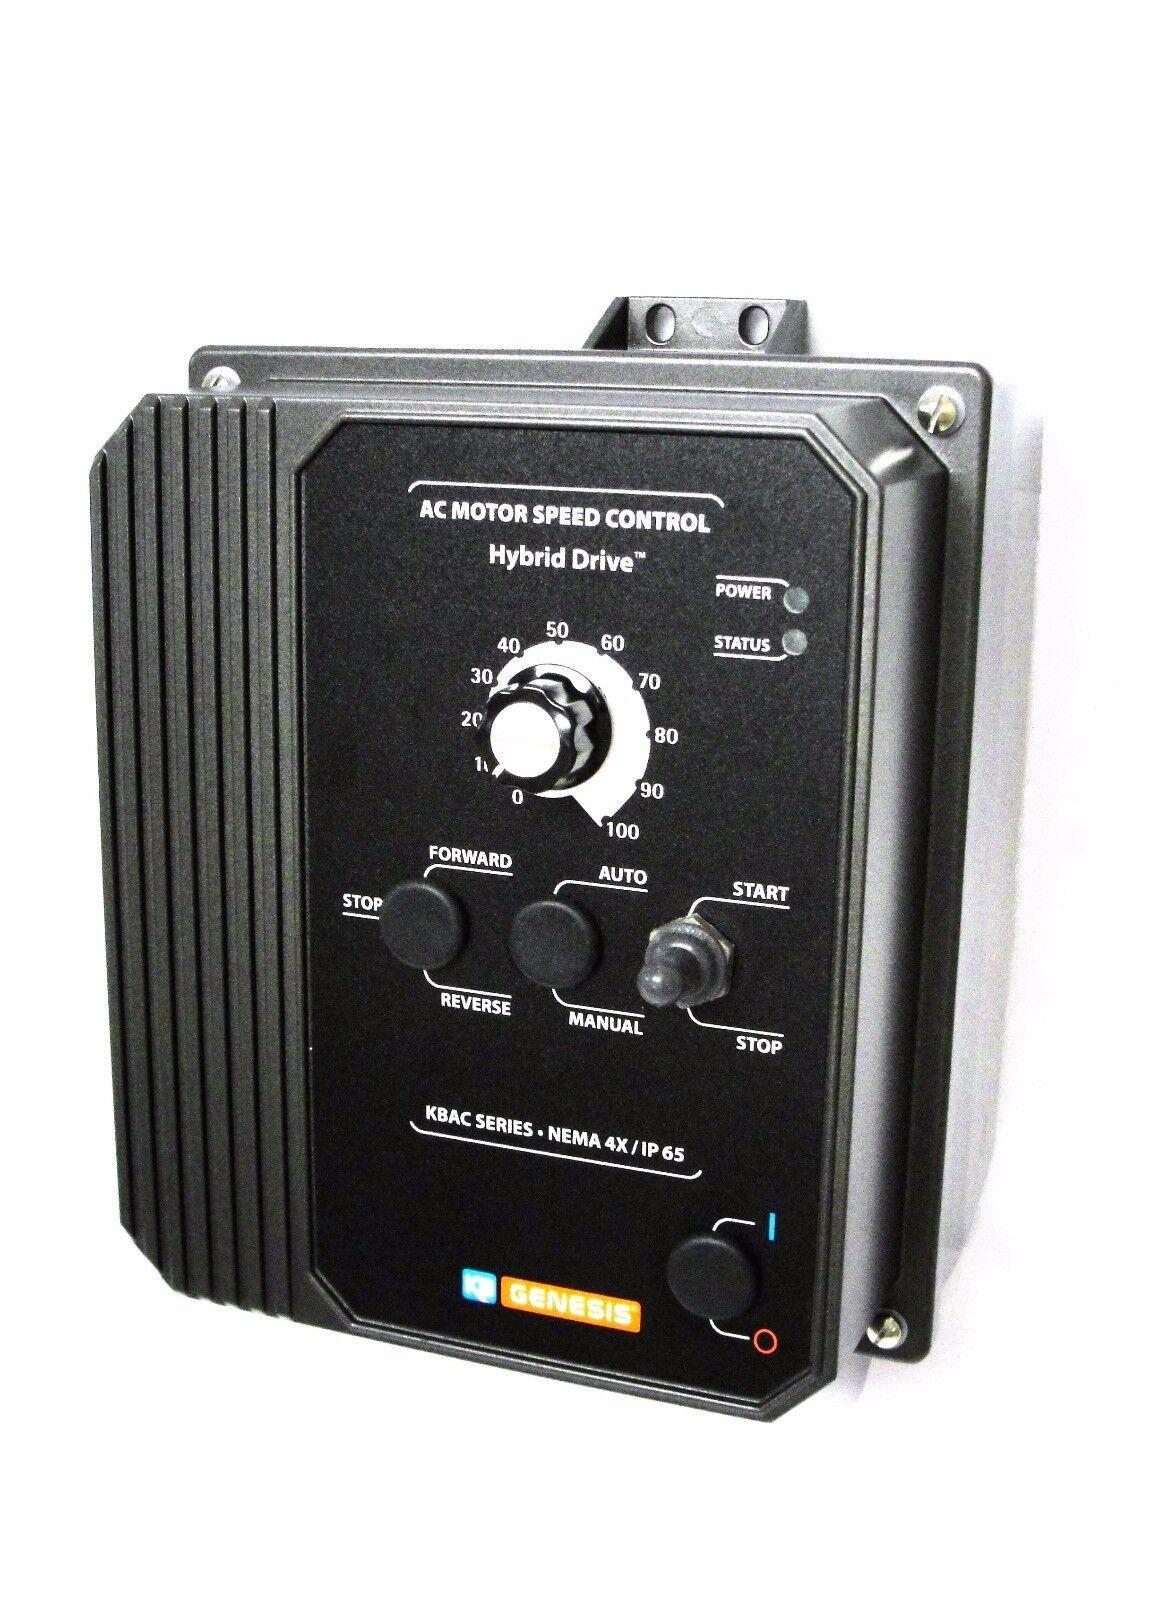 KB Electronics Kbac-29 AC Motor Control 9528 | eBay